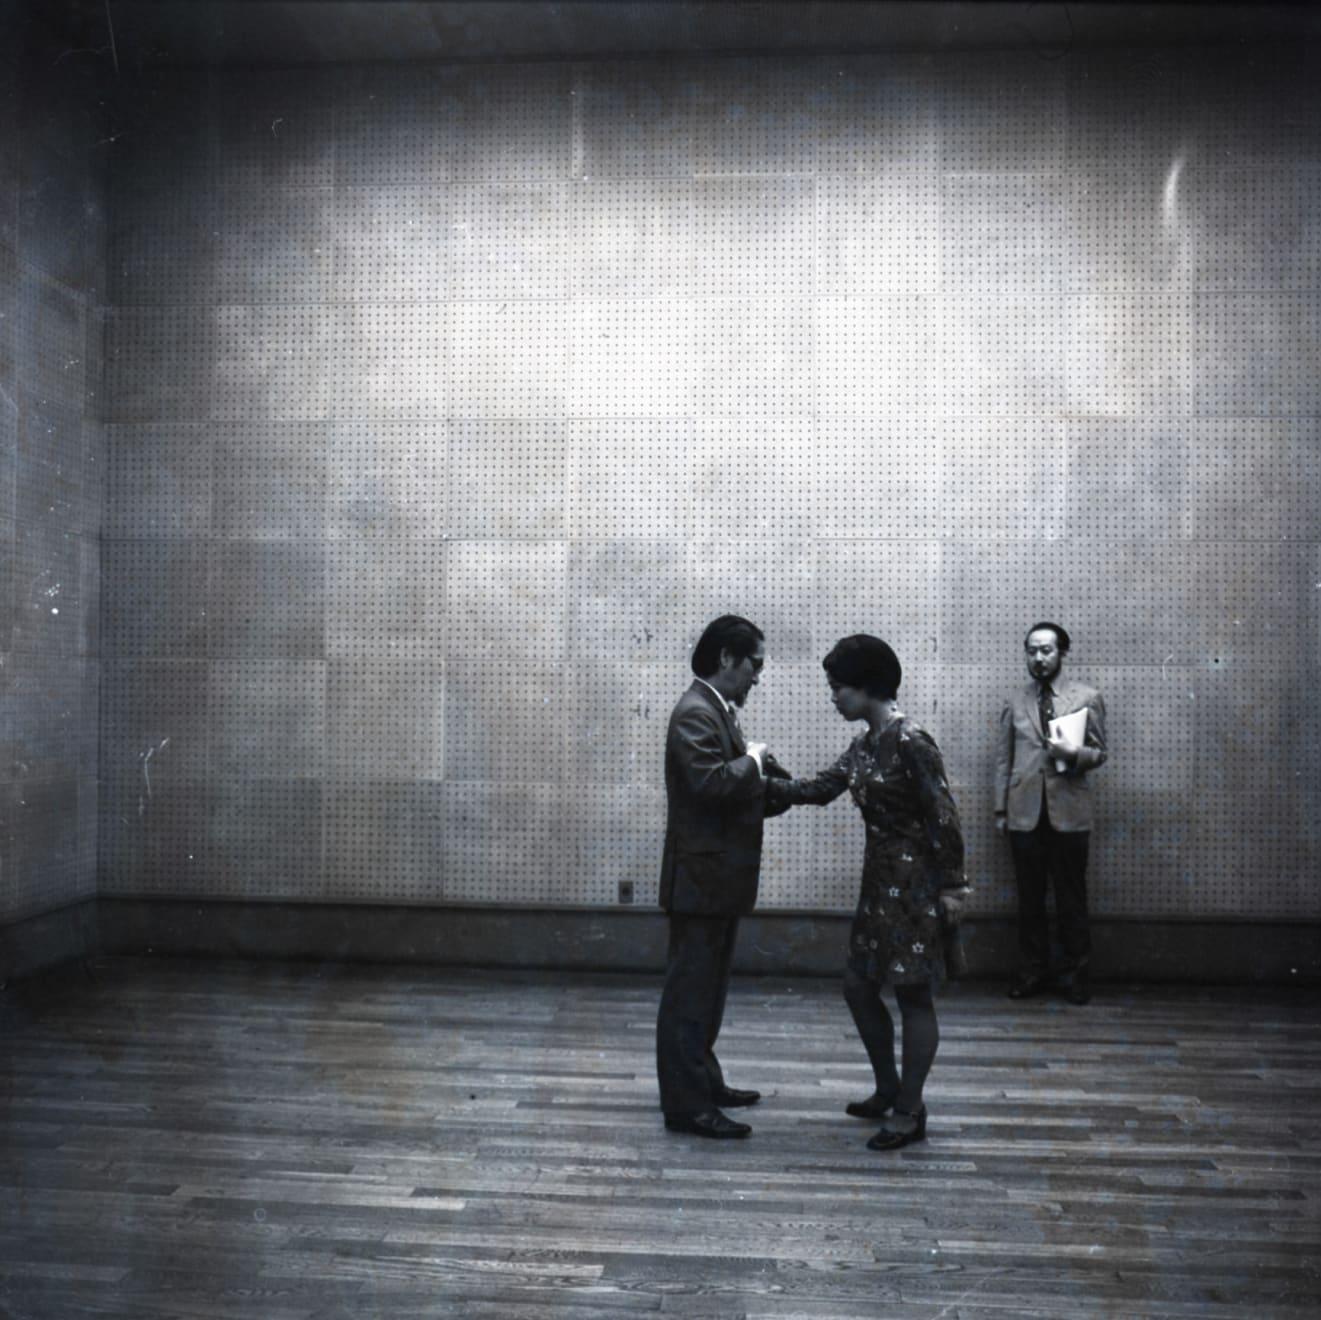 Mitsutoshi Hanaga, Matsuzawa Yutaka Performing 'My Own Death' with Tsujimura Kazuko, witnessed by Yamaguchi Katsuhiro, at 'Tokyo Biennale 1970' at...